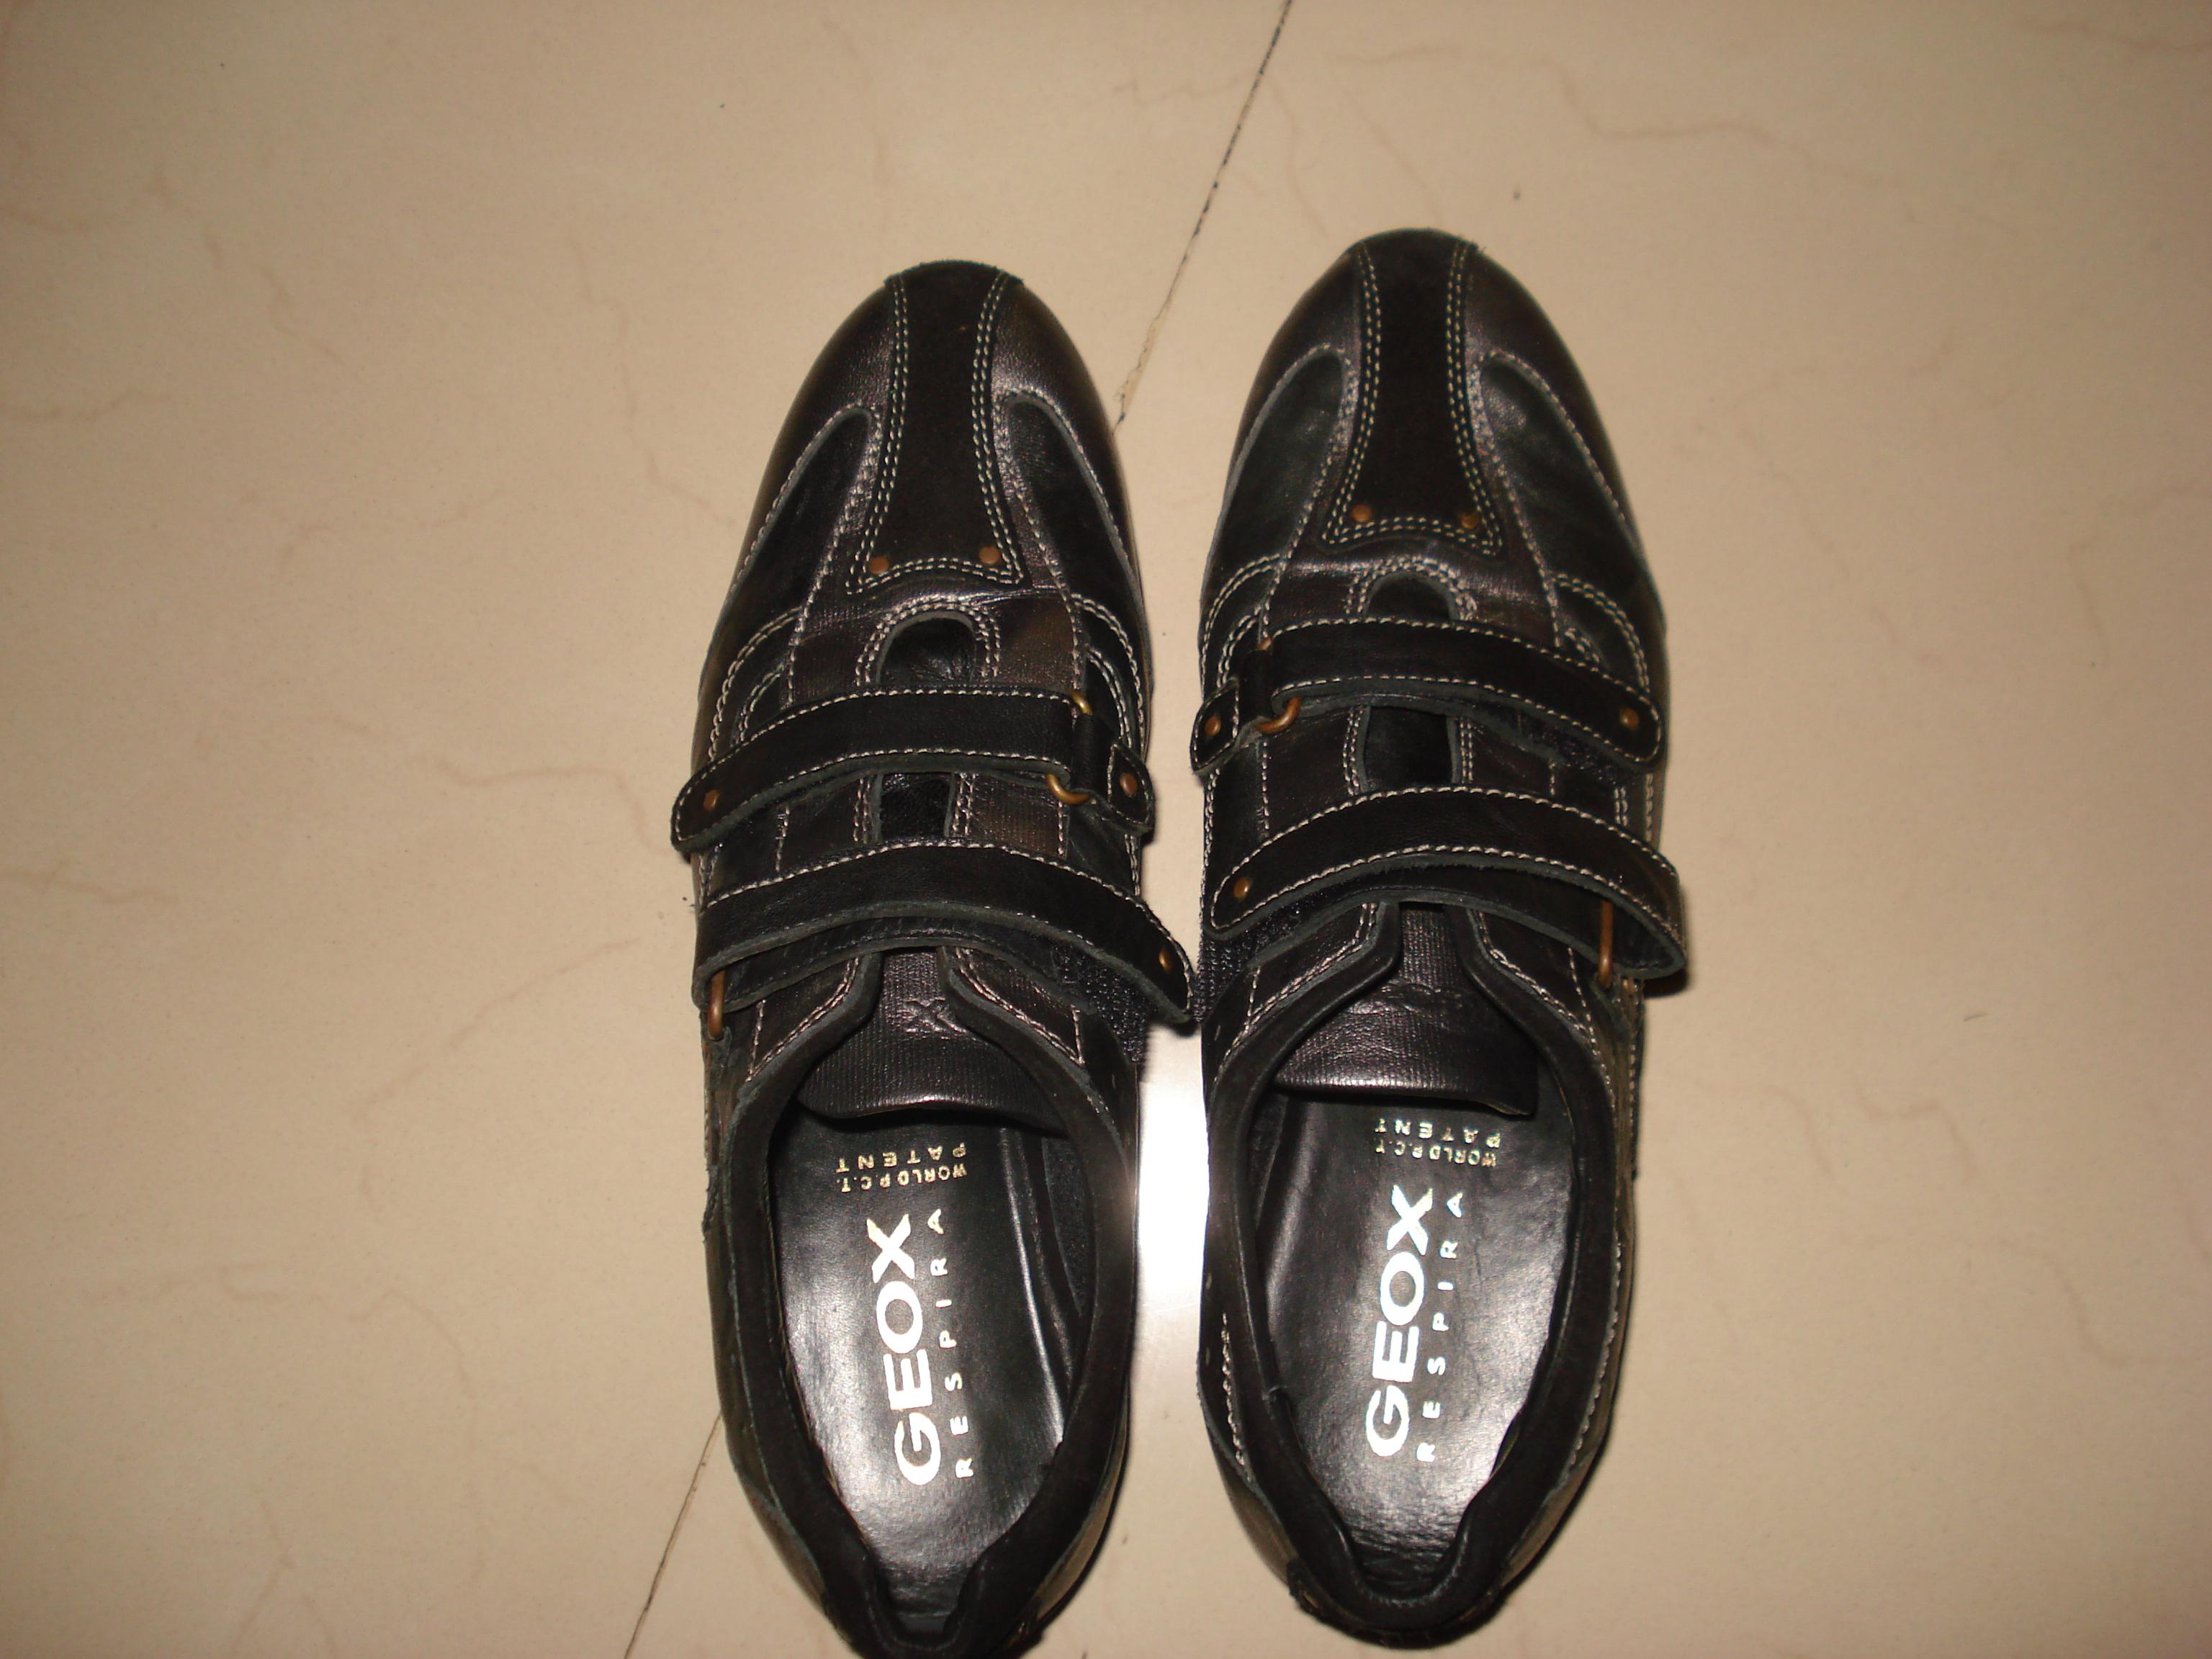 That rare phenomena - smart yet comfortable shoes